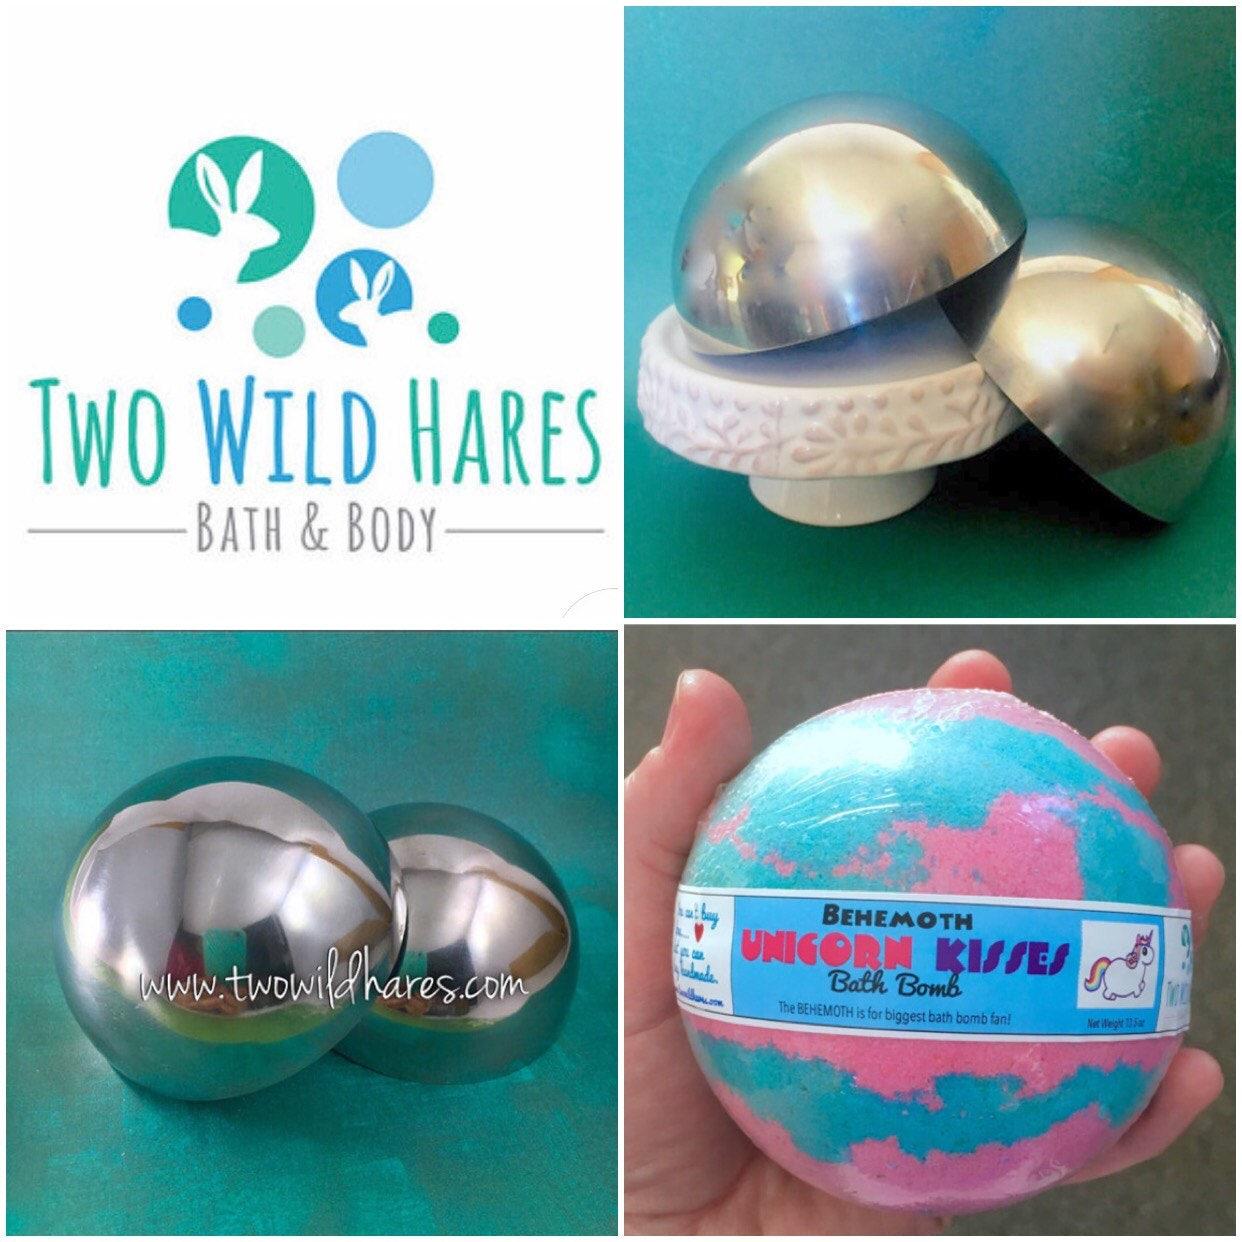 3.5″ BATH BOMB Mold, Heavy Duty, Stainless Steel, Almost Softball ...